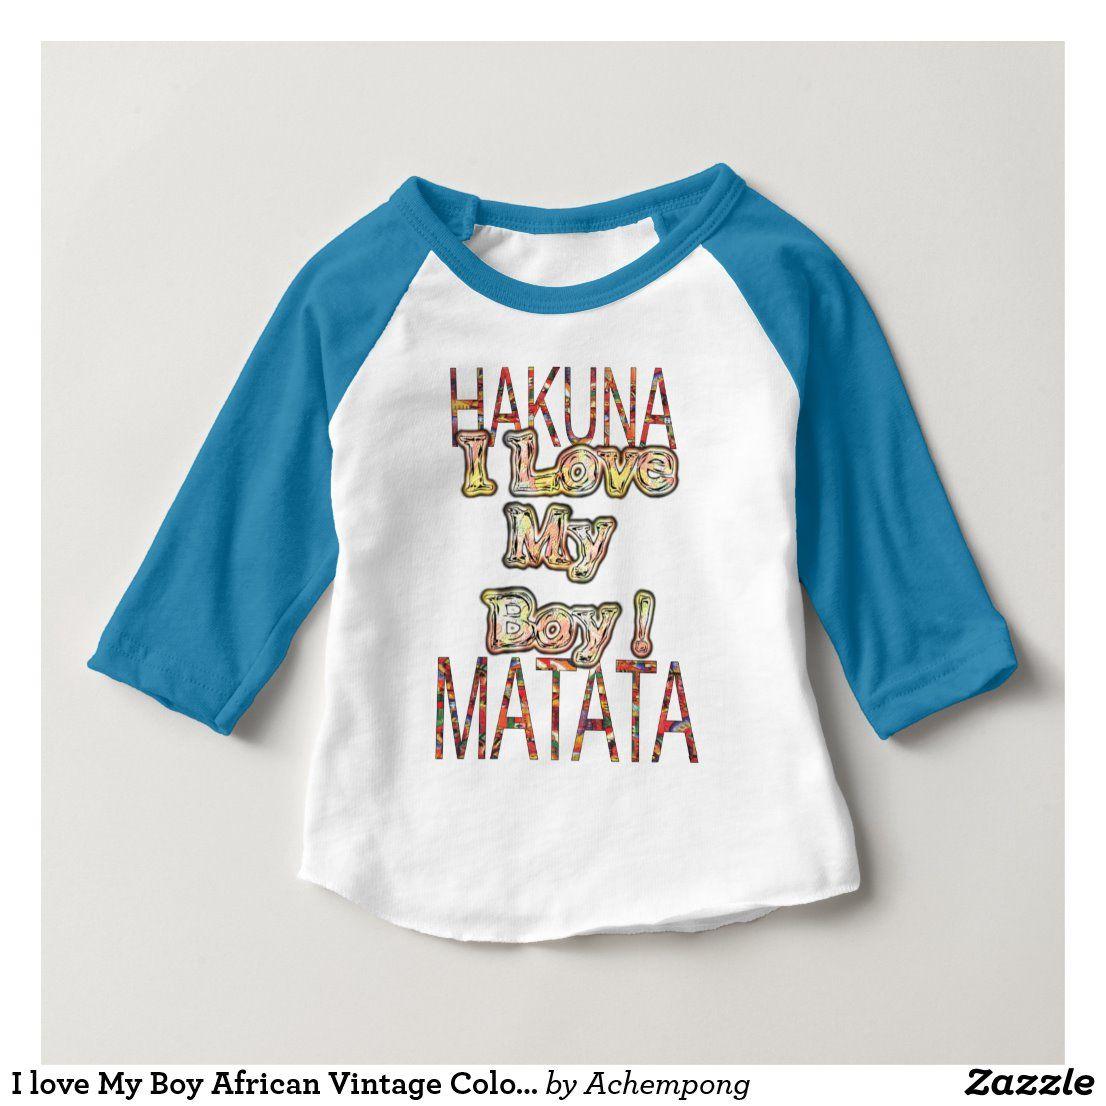 I love My Boy African Vintage Colors Hakuna matata Baby T